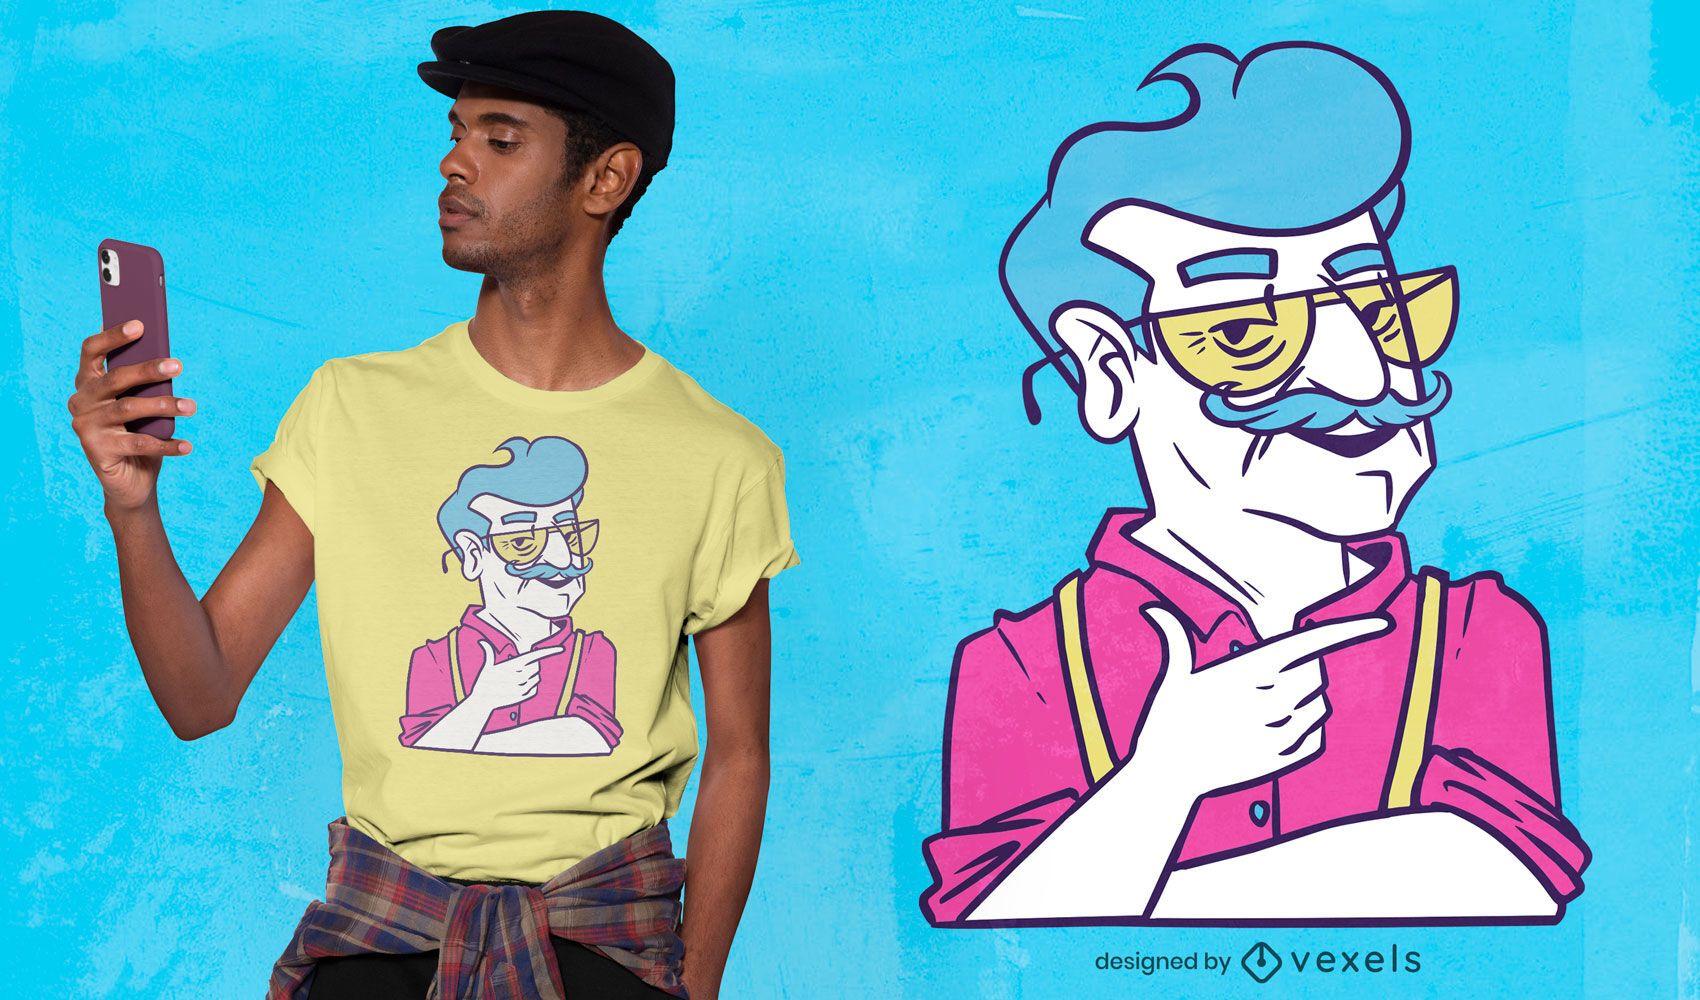 Cool grandpa t-shirt design